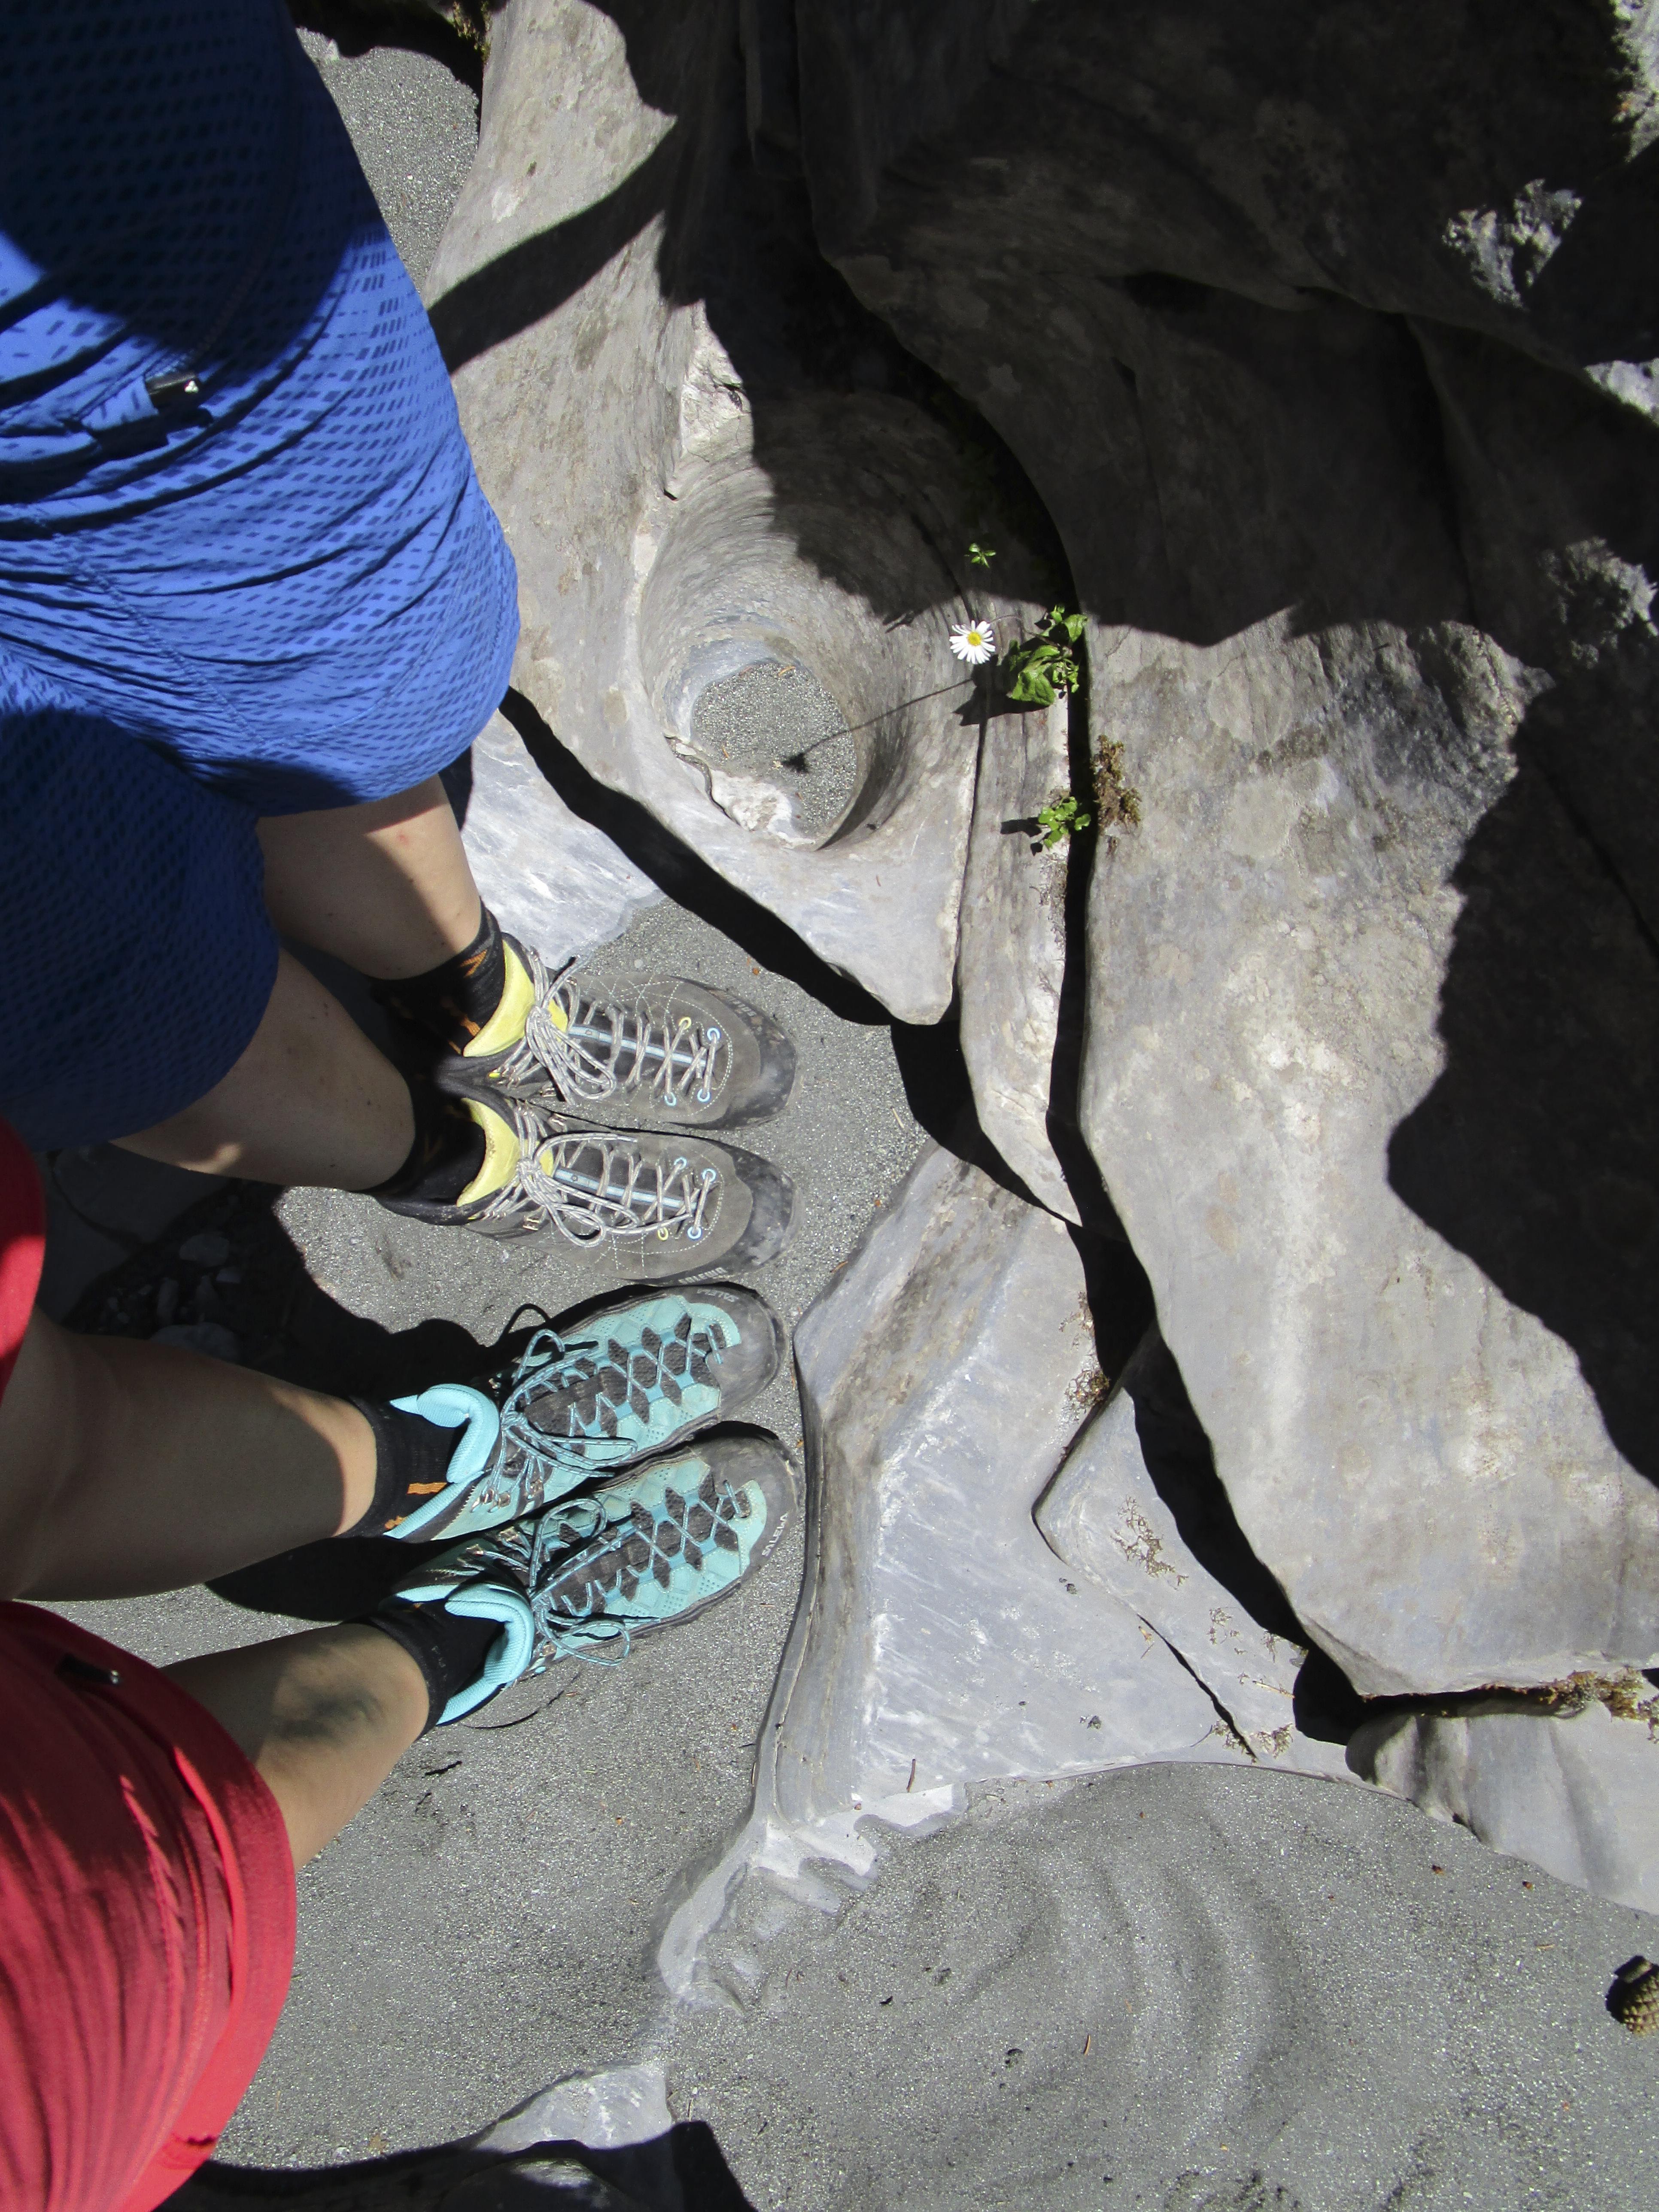 Fuß-Spaß: Trutg dil Flem